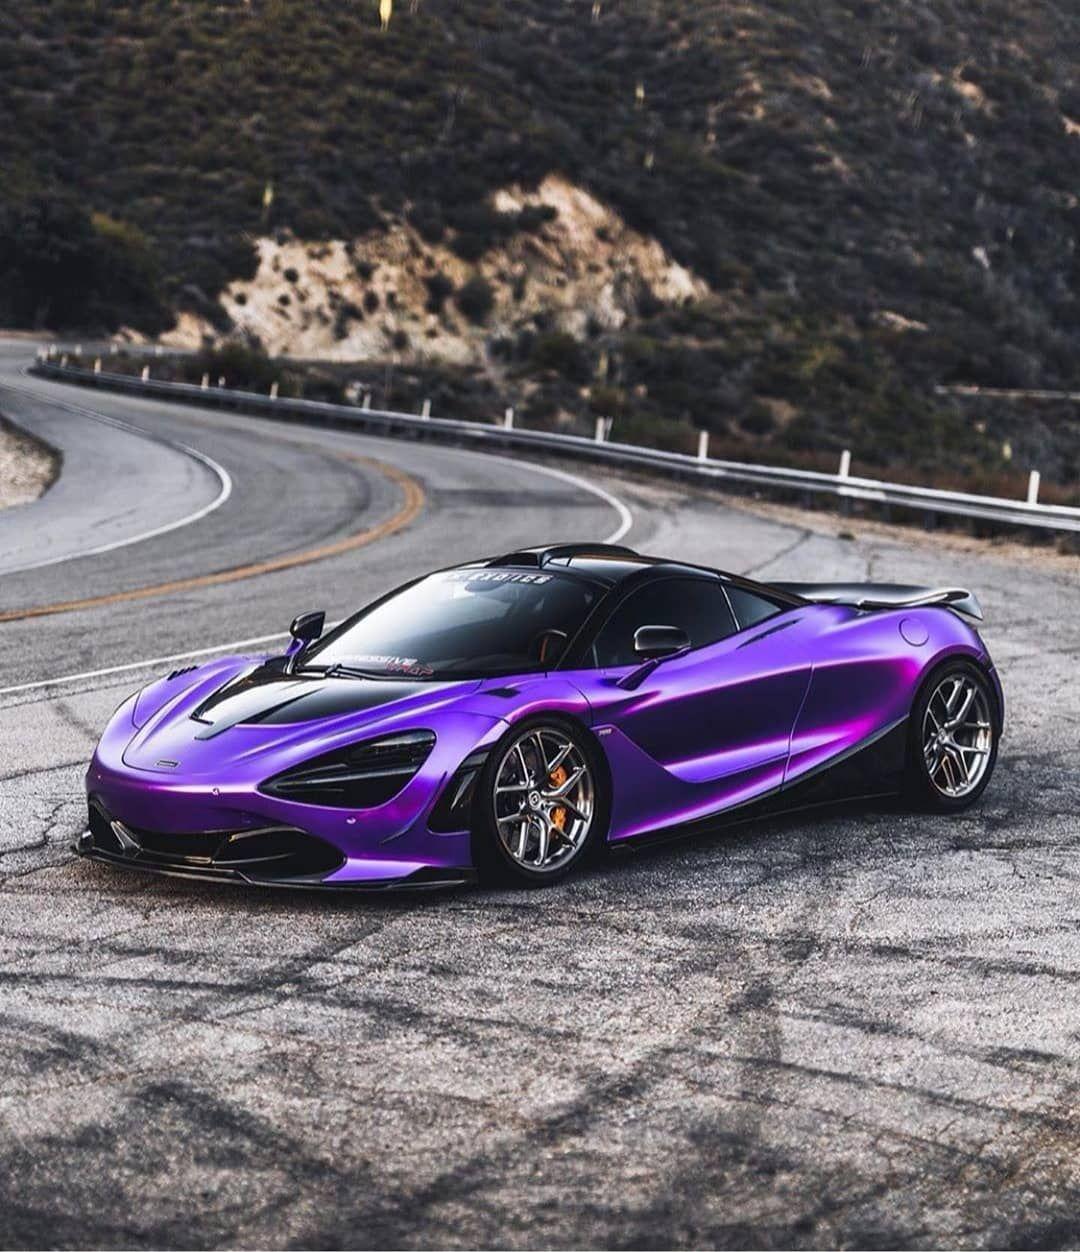 Mclaren 720s In Frozen Purple Chrome Super Cars Sports Car